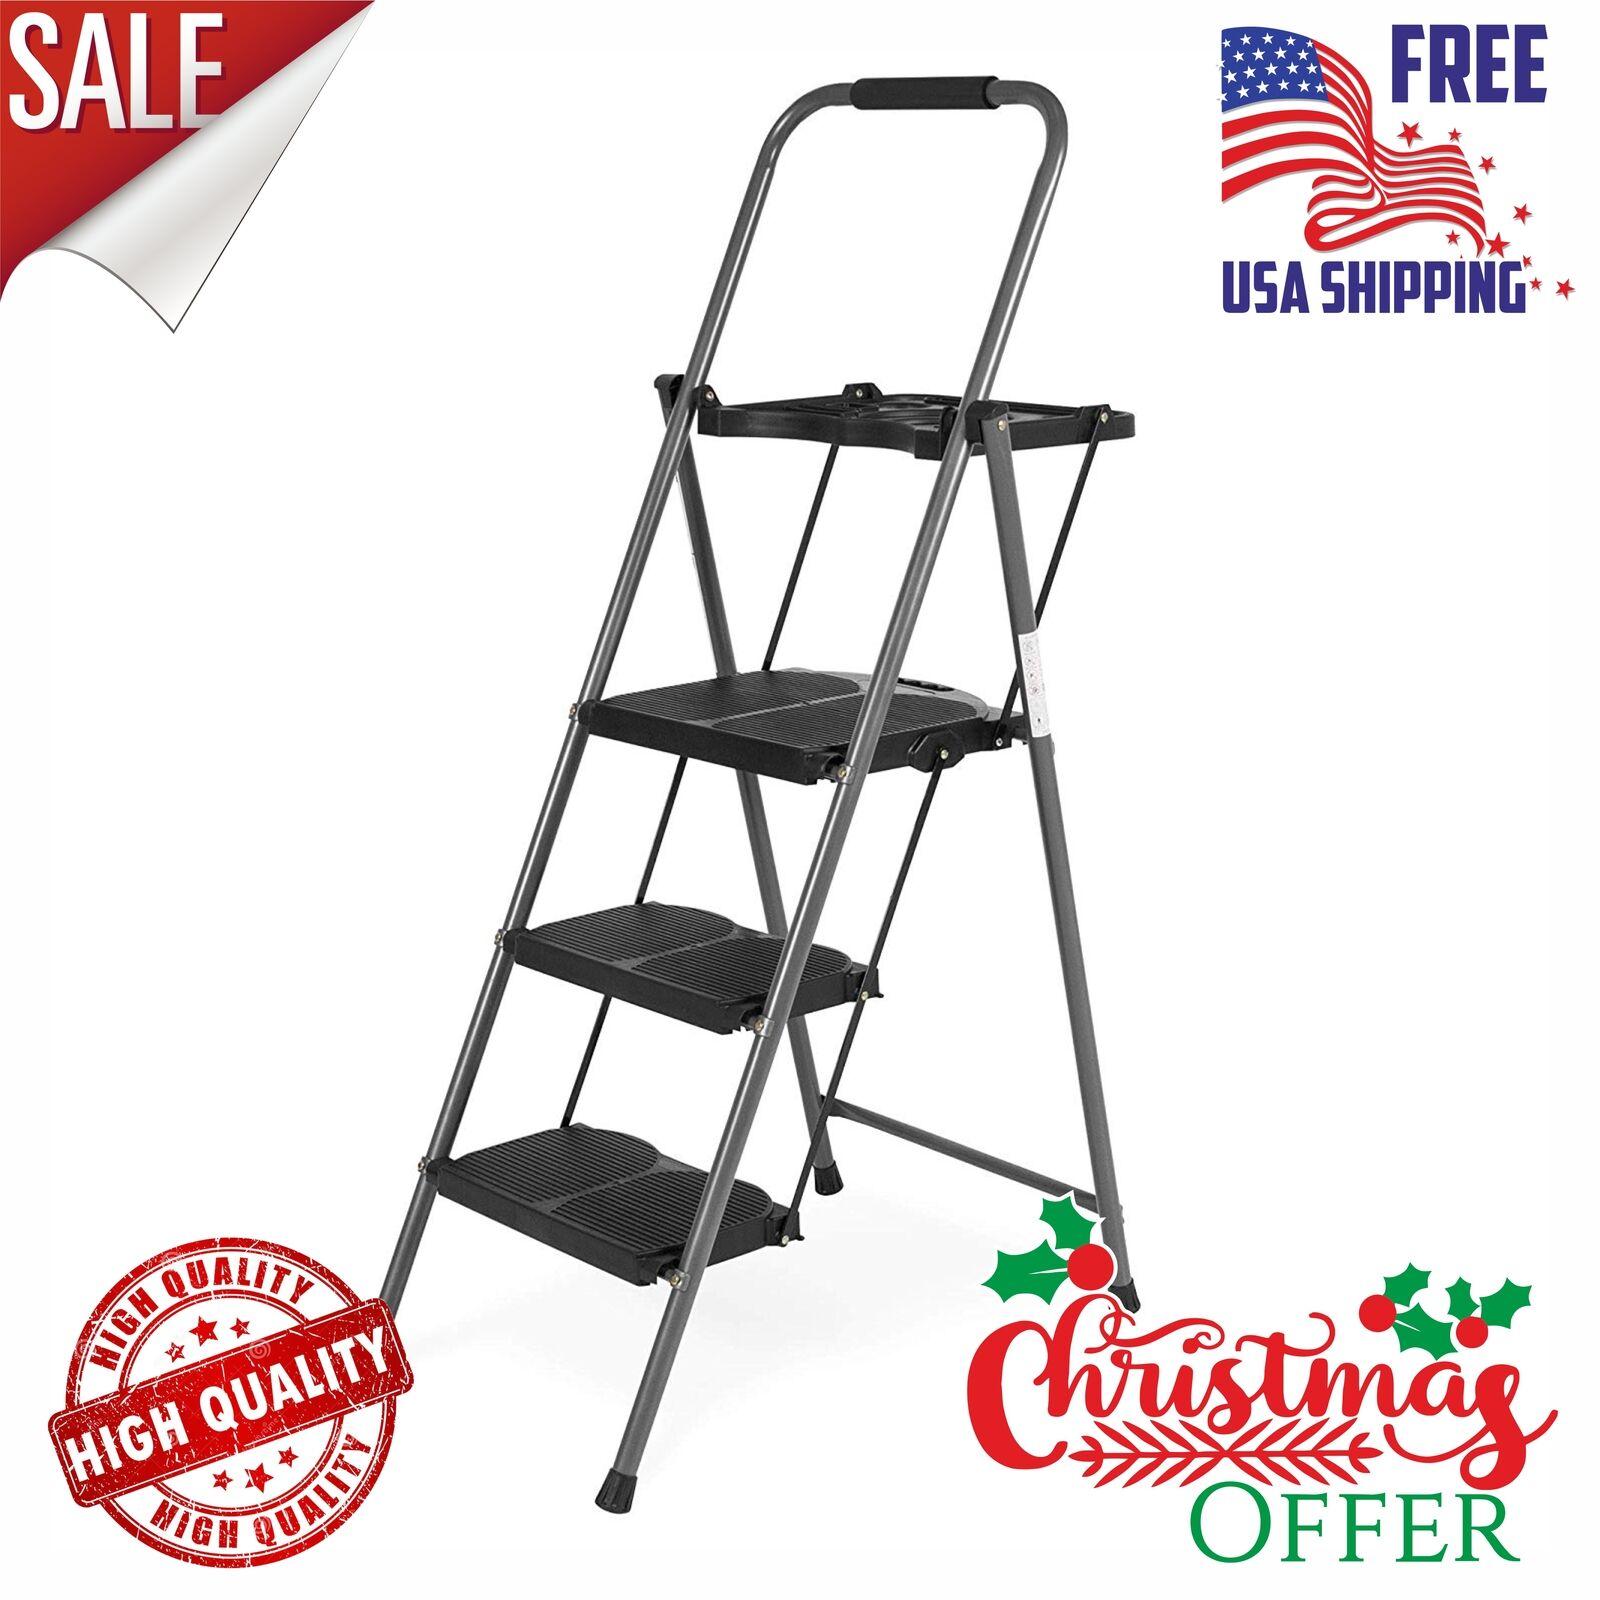 Best Choice Folding Steel 3-Step Stool Ladder Tool Equipment